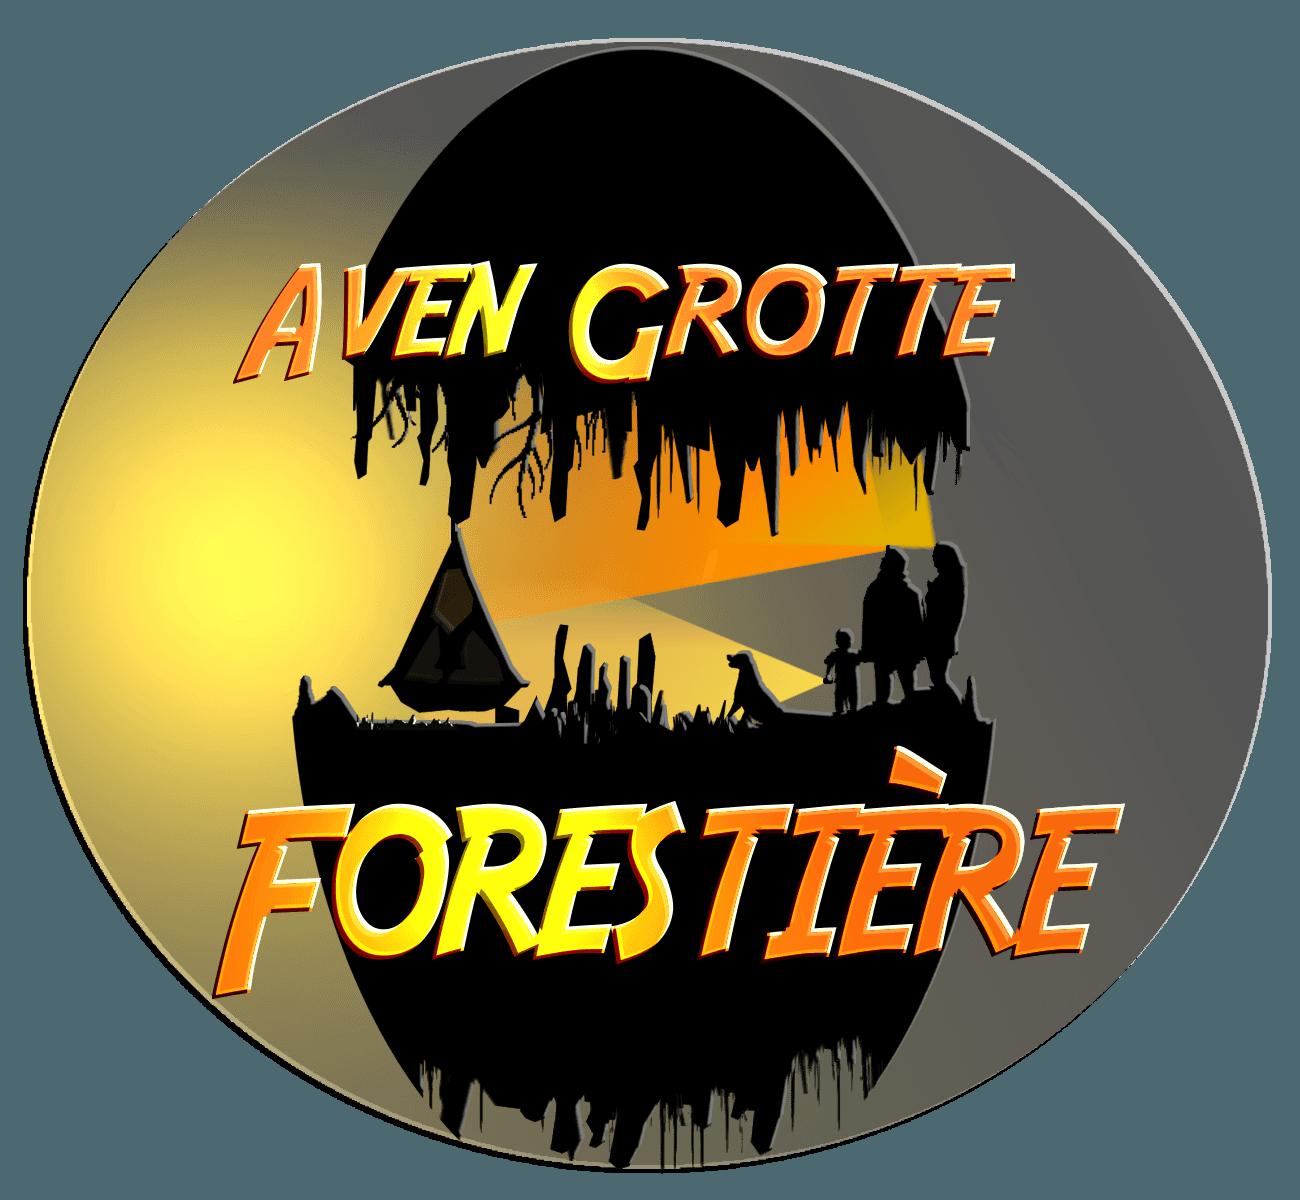 grotte_logo_site2